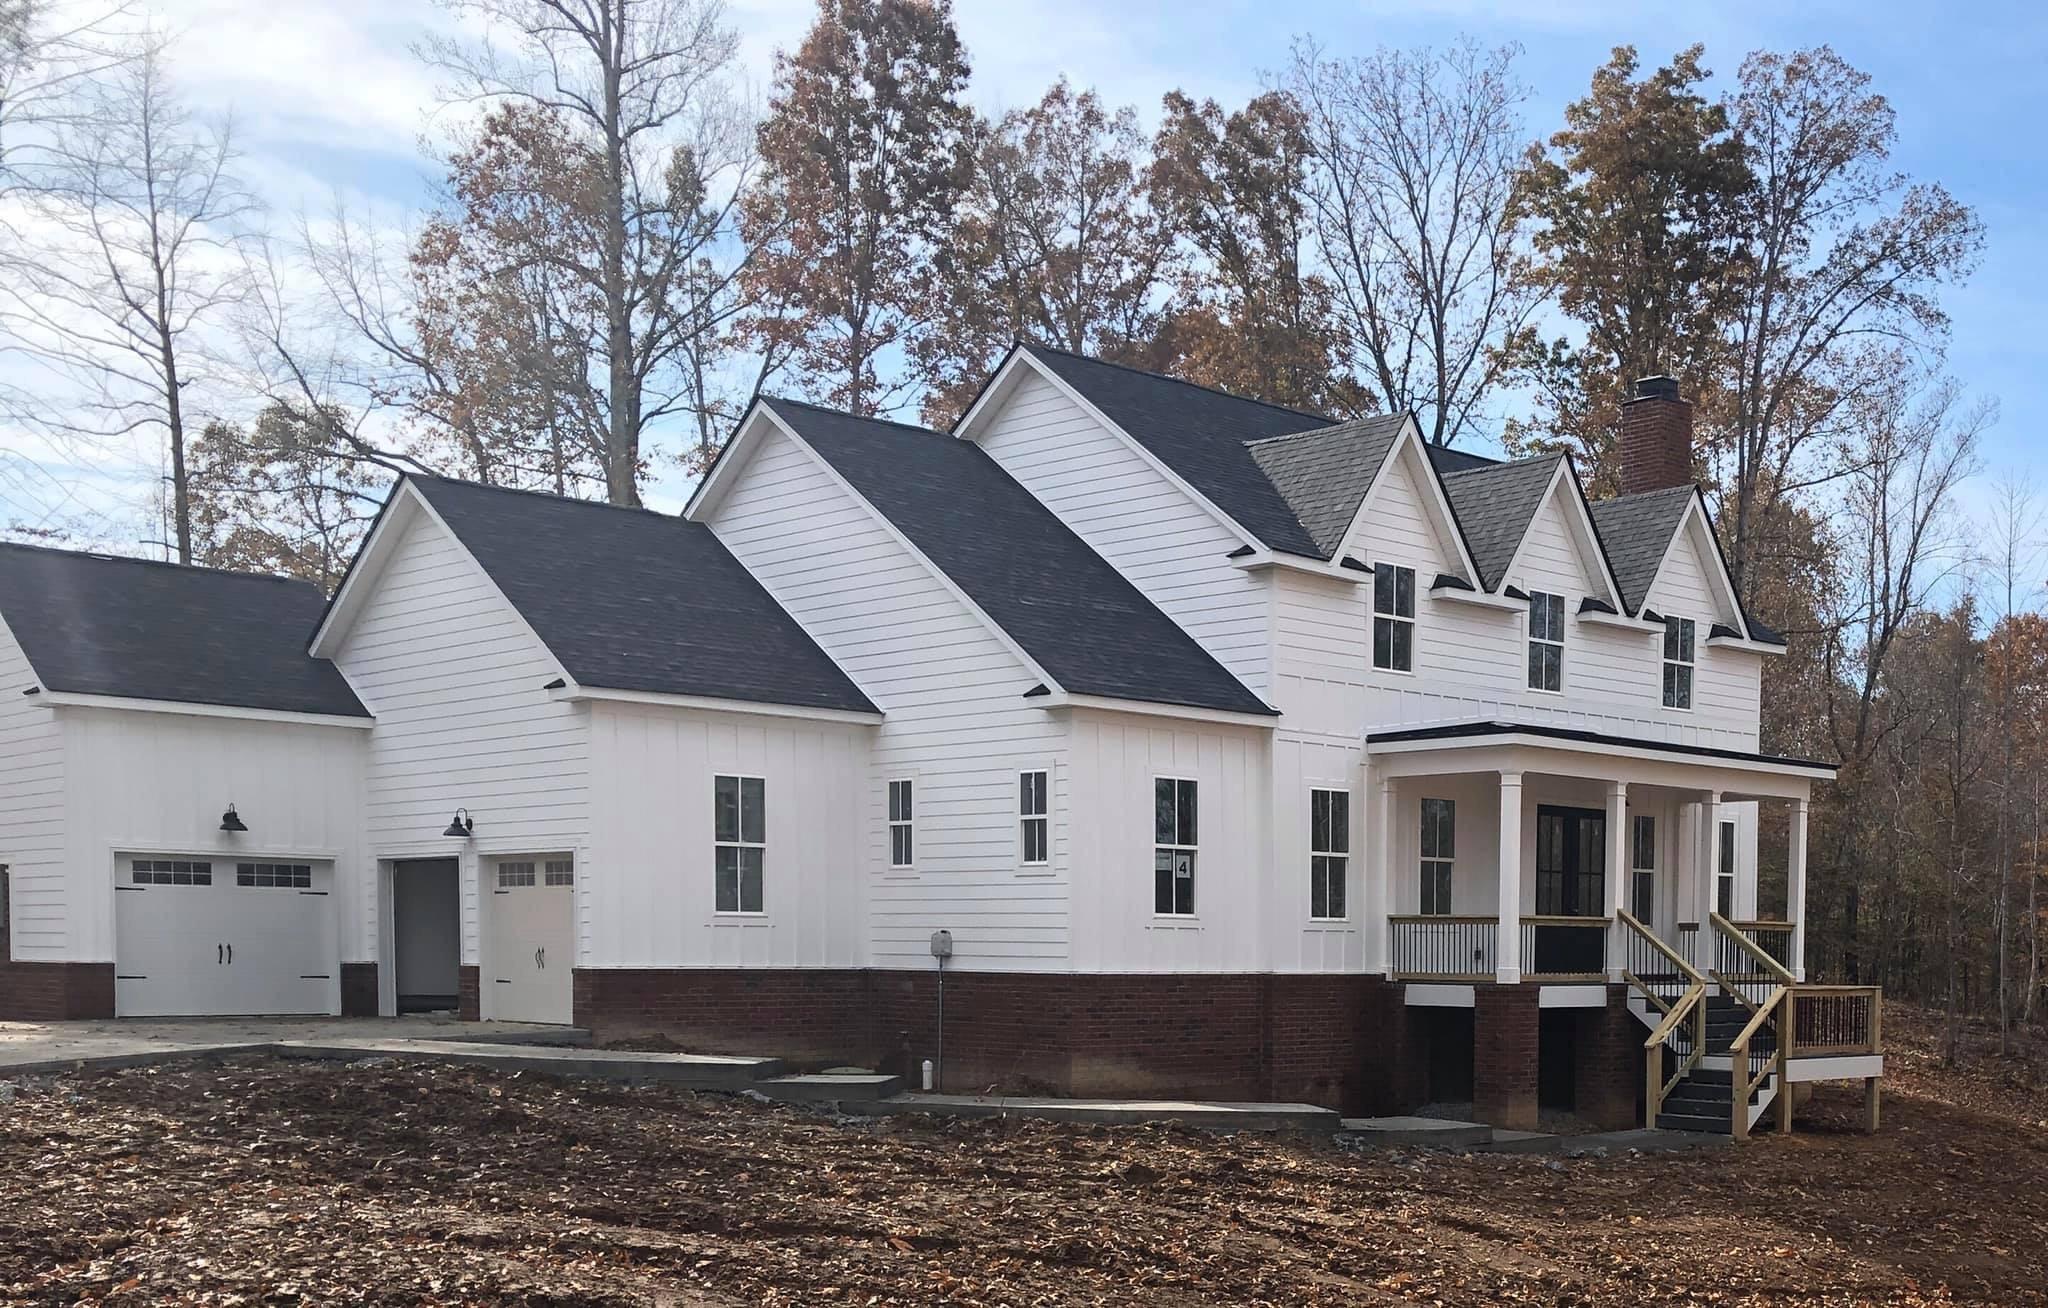 $546,125 - 4Br/4Ba -  for Sale in Regent Homes, Fairview